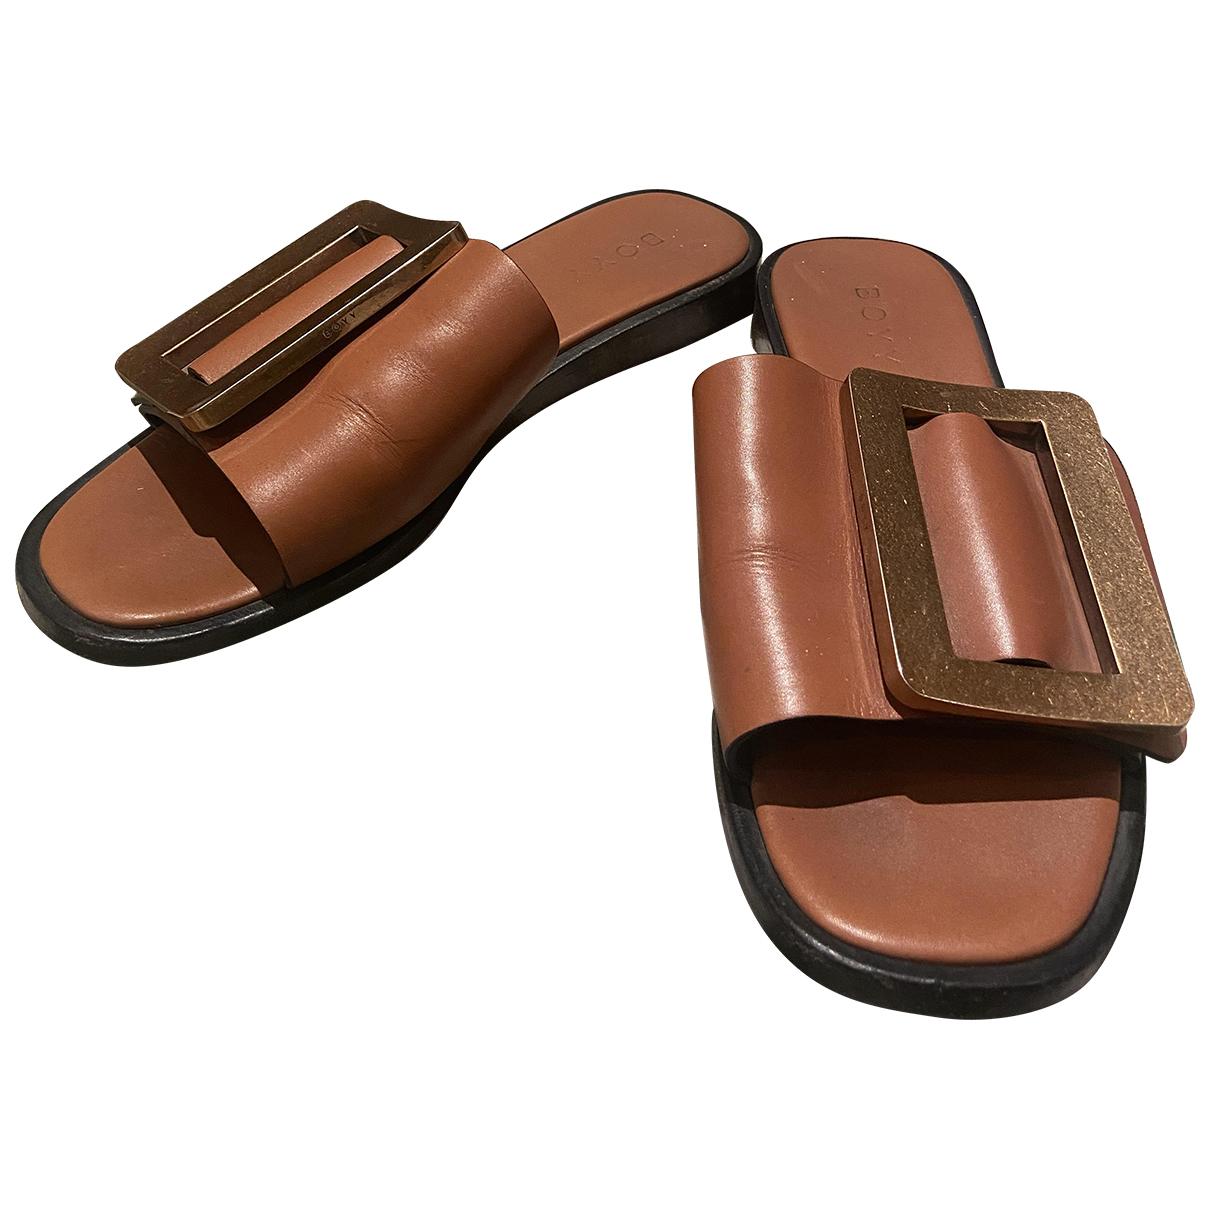 Boyy \N Camel Leather Sandals for Women 37 EU